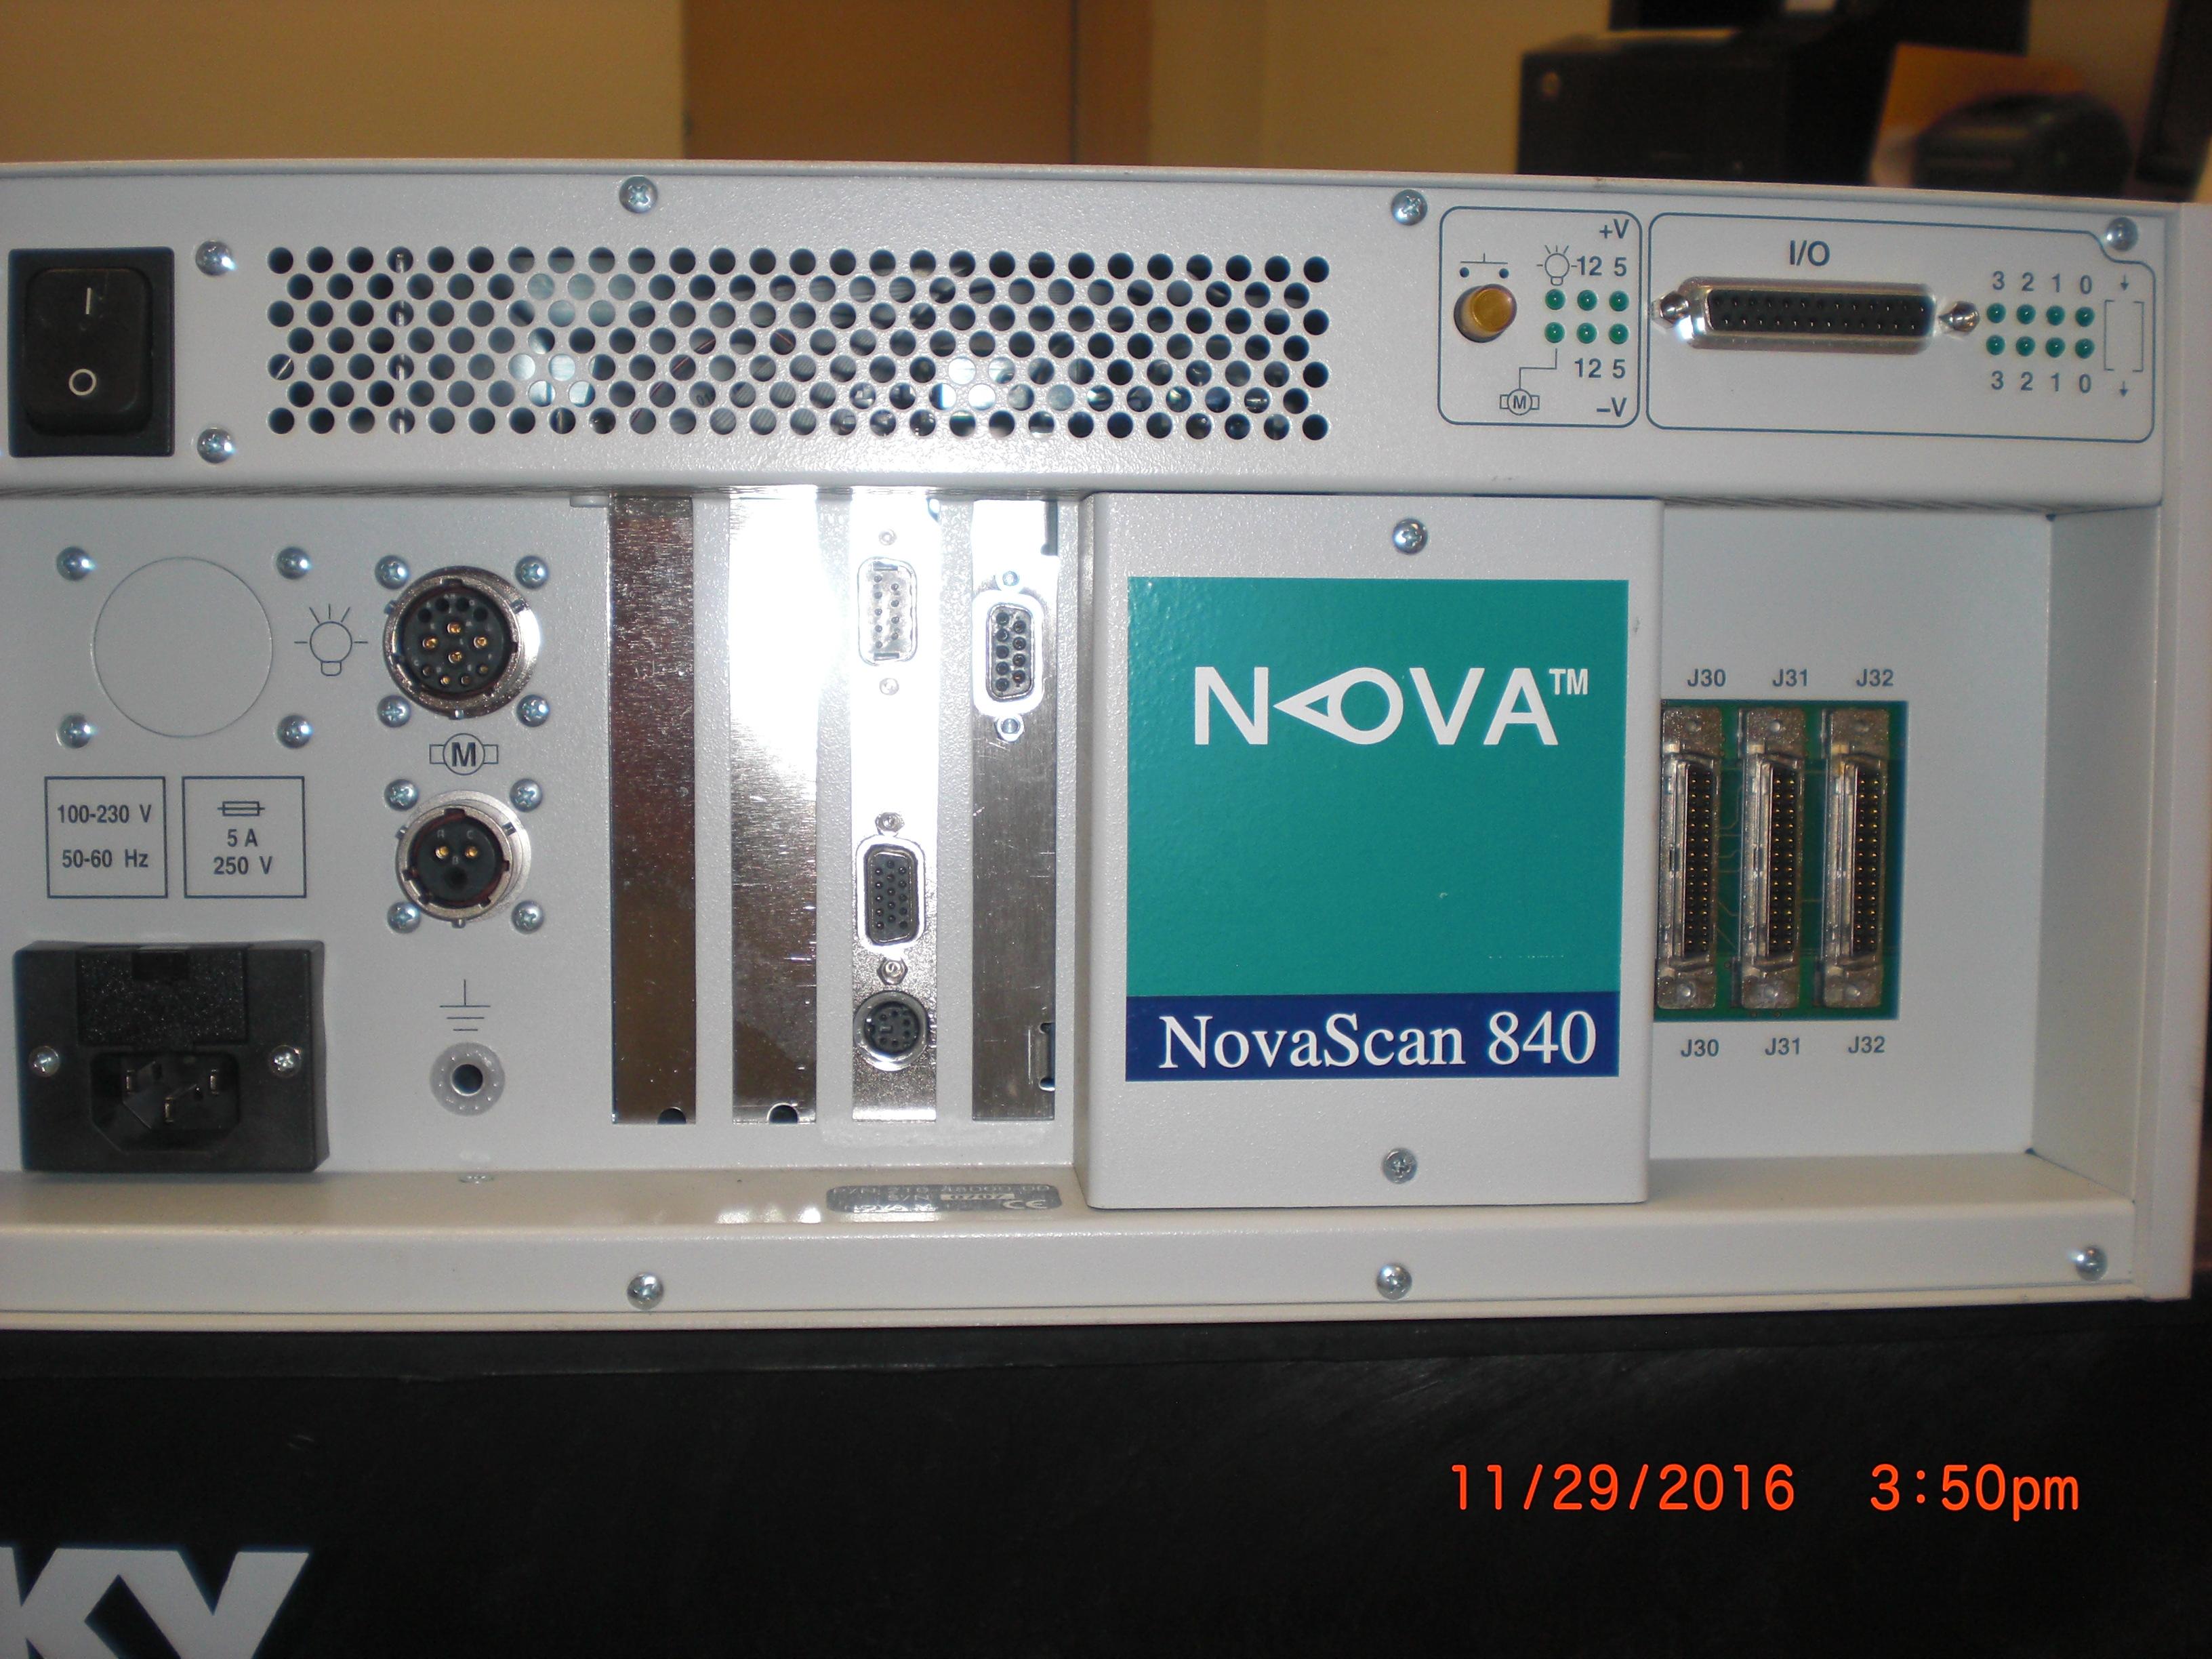 Controller NovaScan 840  AMAT 0190-77284  NOVA 210-4800-01 sn0707